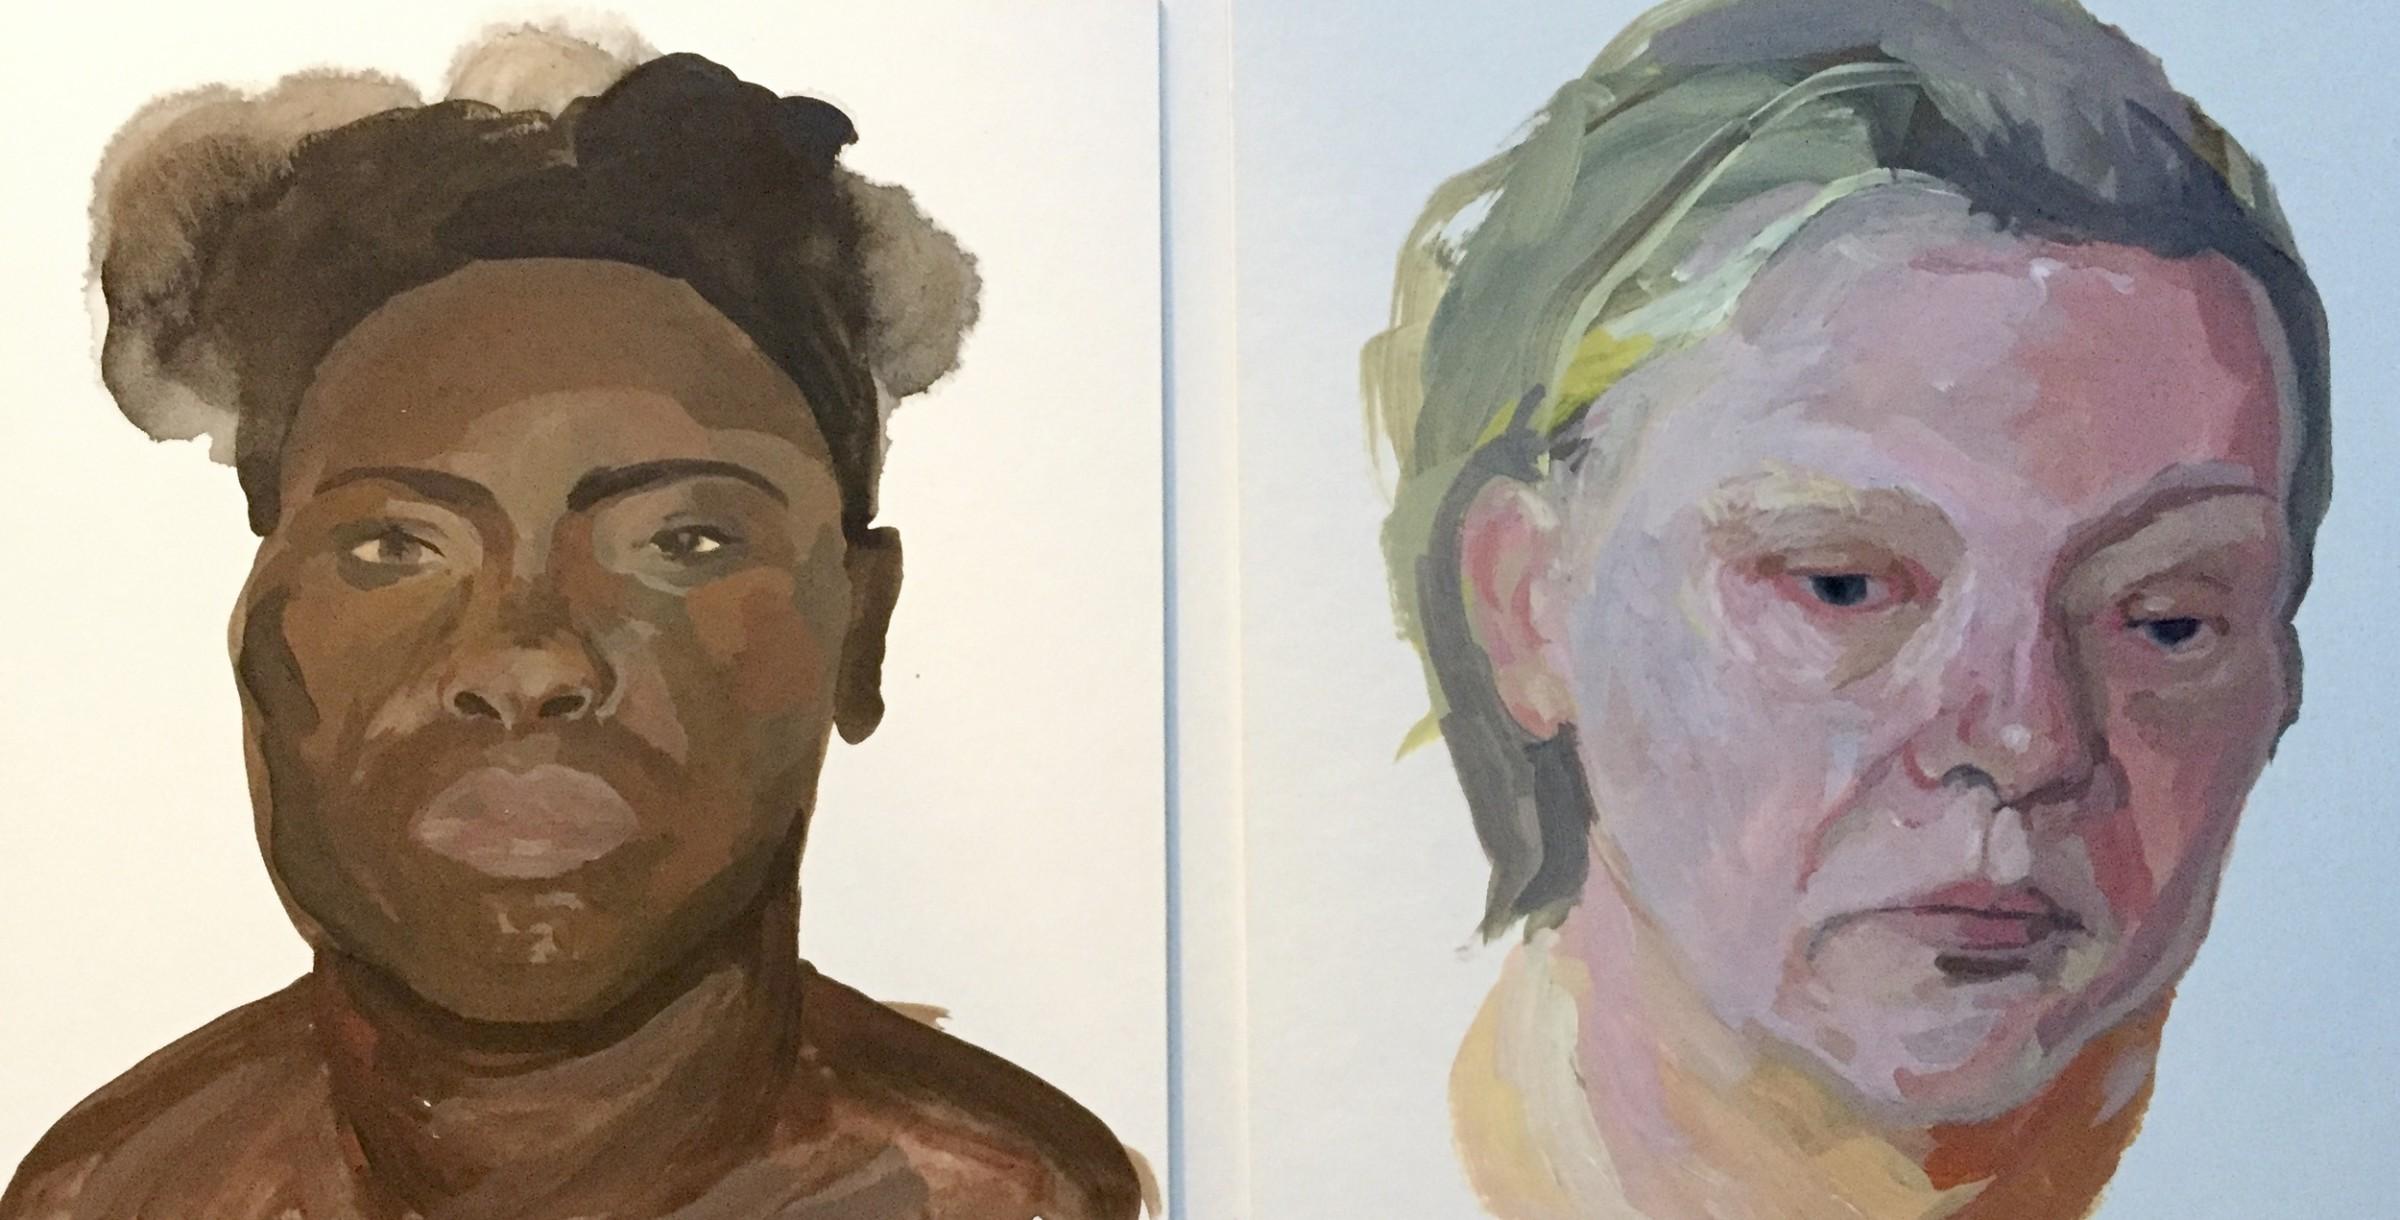 <span class=&#34;link fancybox-details-link&#34;><a href=&#34;/exhibitions/24/works/artworks_standalone10760/&#34;>View Detail Page</a></span><div class=&#34;artist&#34;><span class=&#34;artist&#34;><strong>Claire Parrish</strong></span></div><div class=&#34;title&#34;><em>Inmates of Ohio Reformatory for Women</em></div><div class=&#34;medium&#34;>lascaux acrylic</div><div class=&#34;dimensions&#34;>50x35</div>